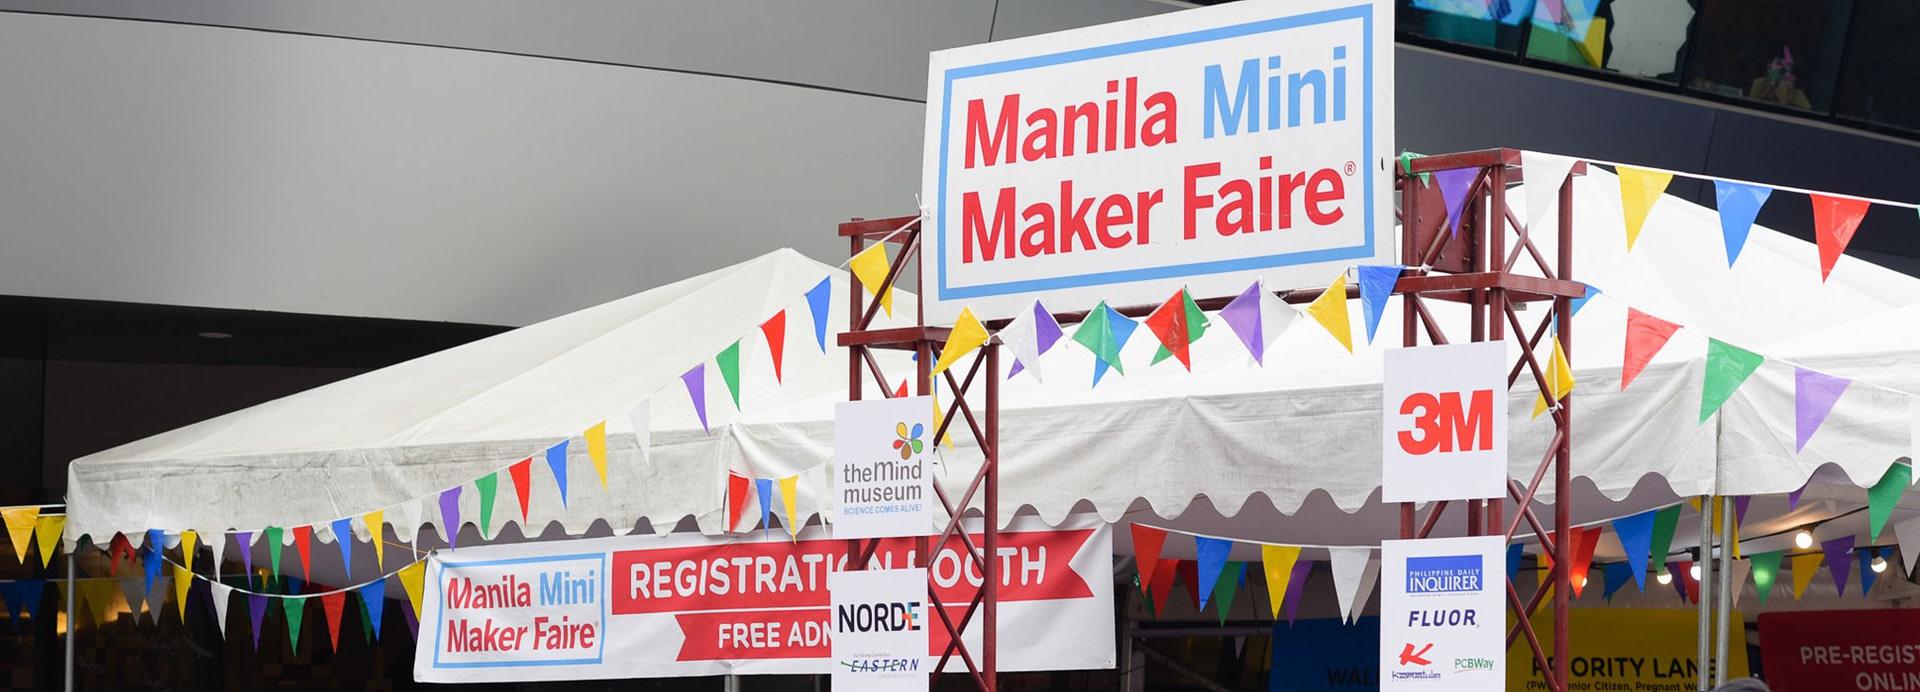 Manila Mini Maker Faire 2019: Festival of Creations